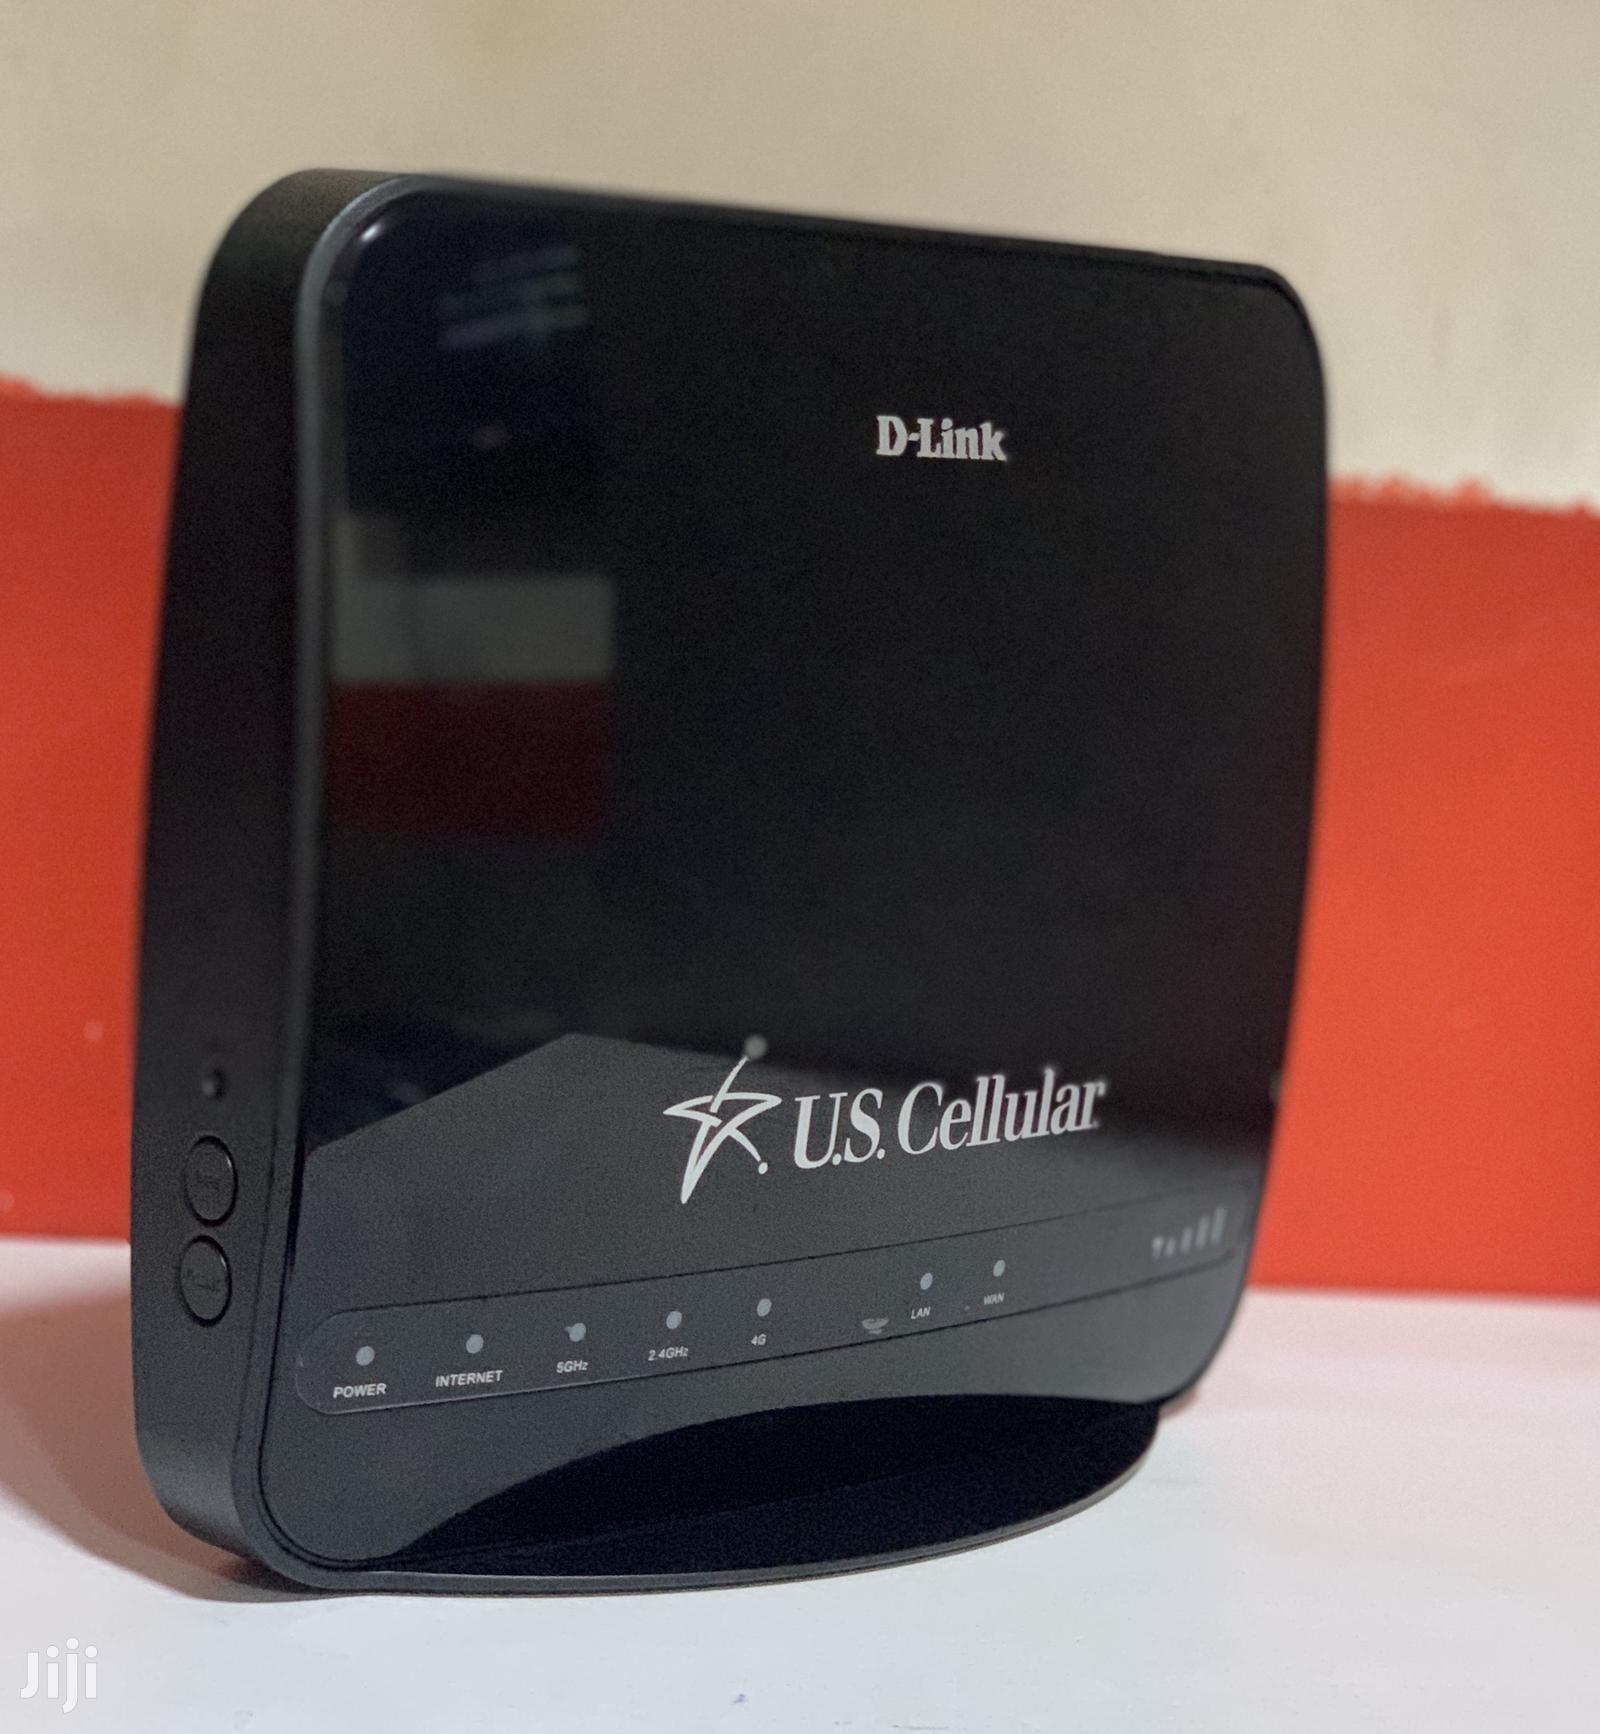 D Link DWR-961 US Cellular Router